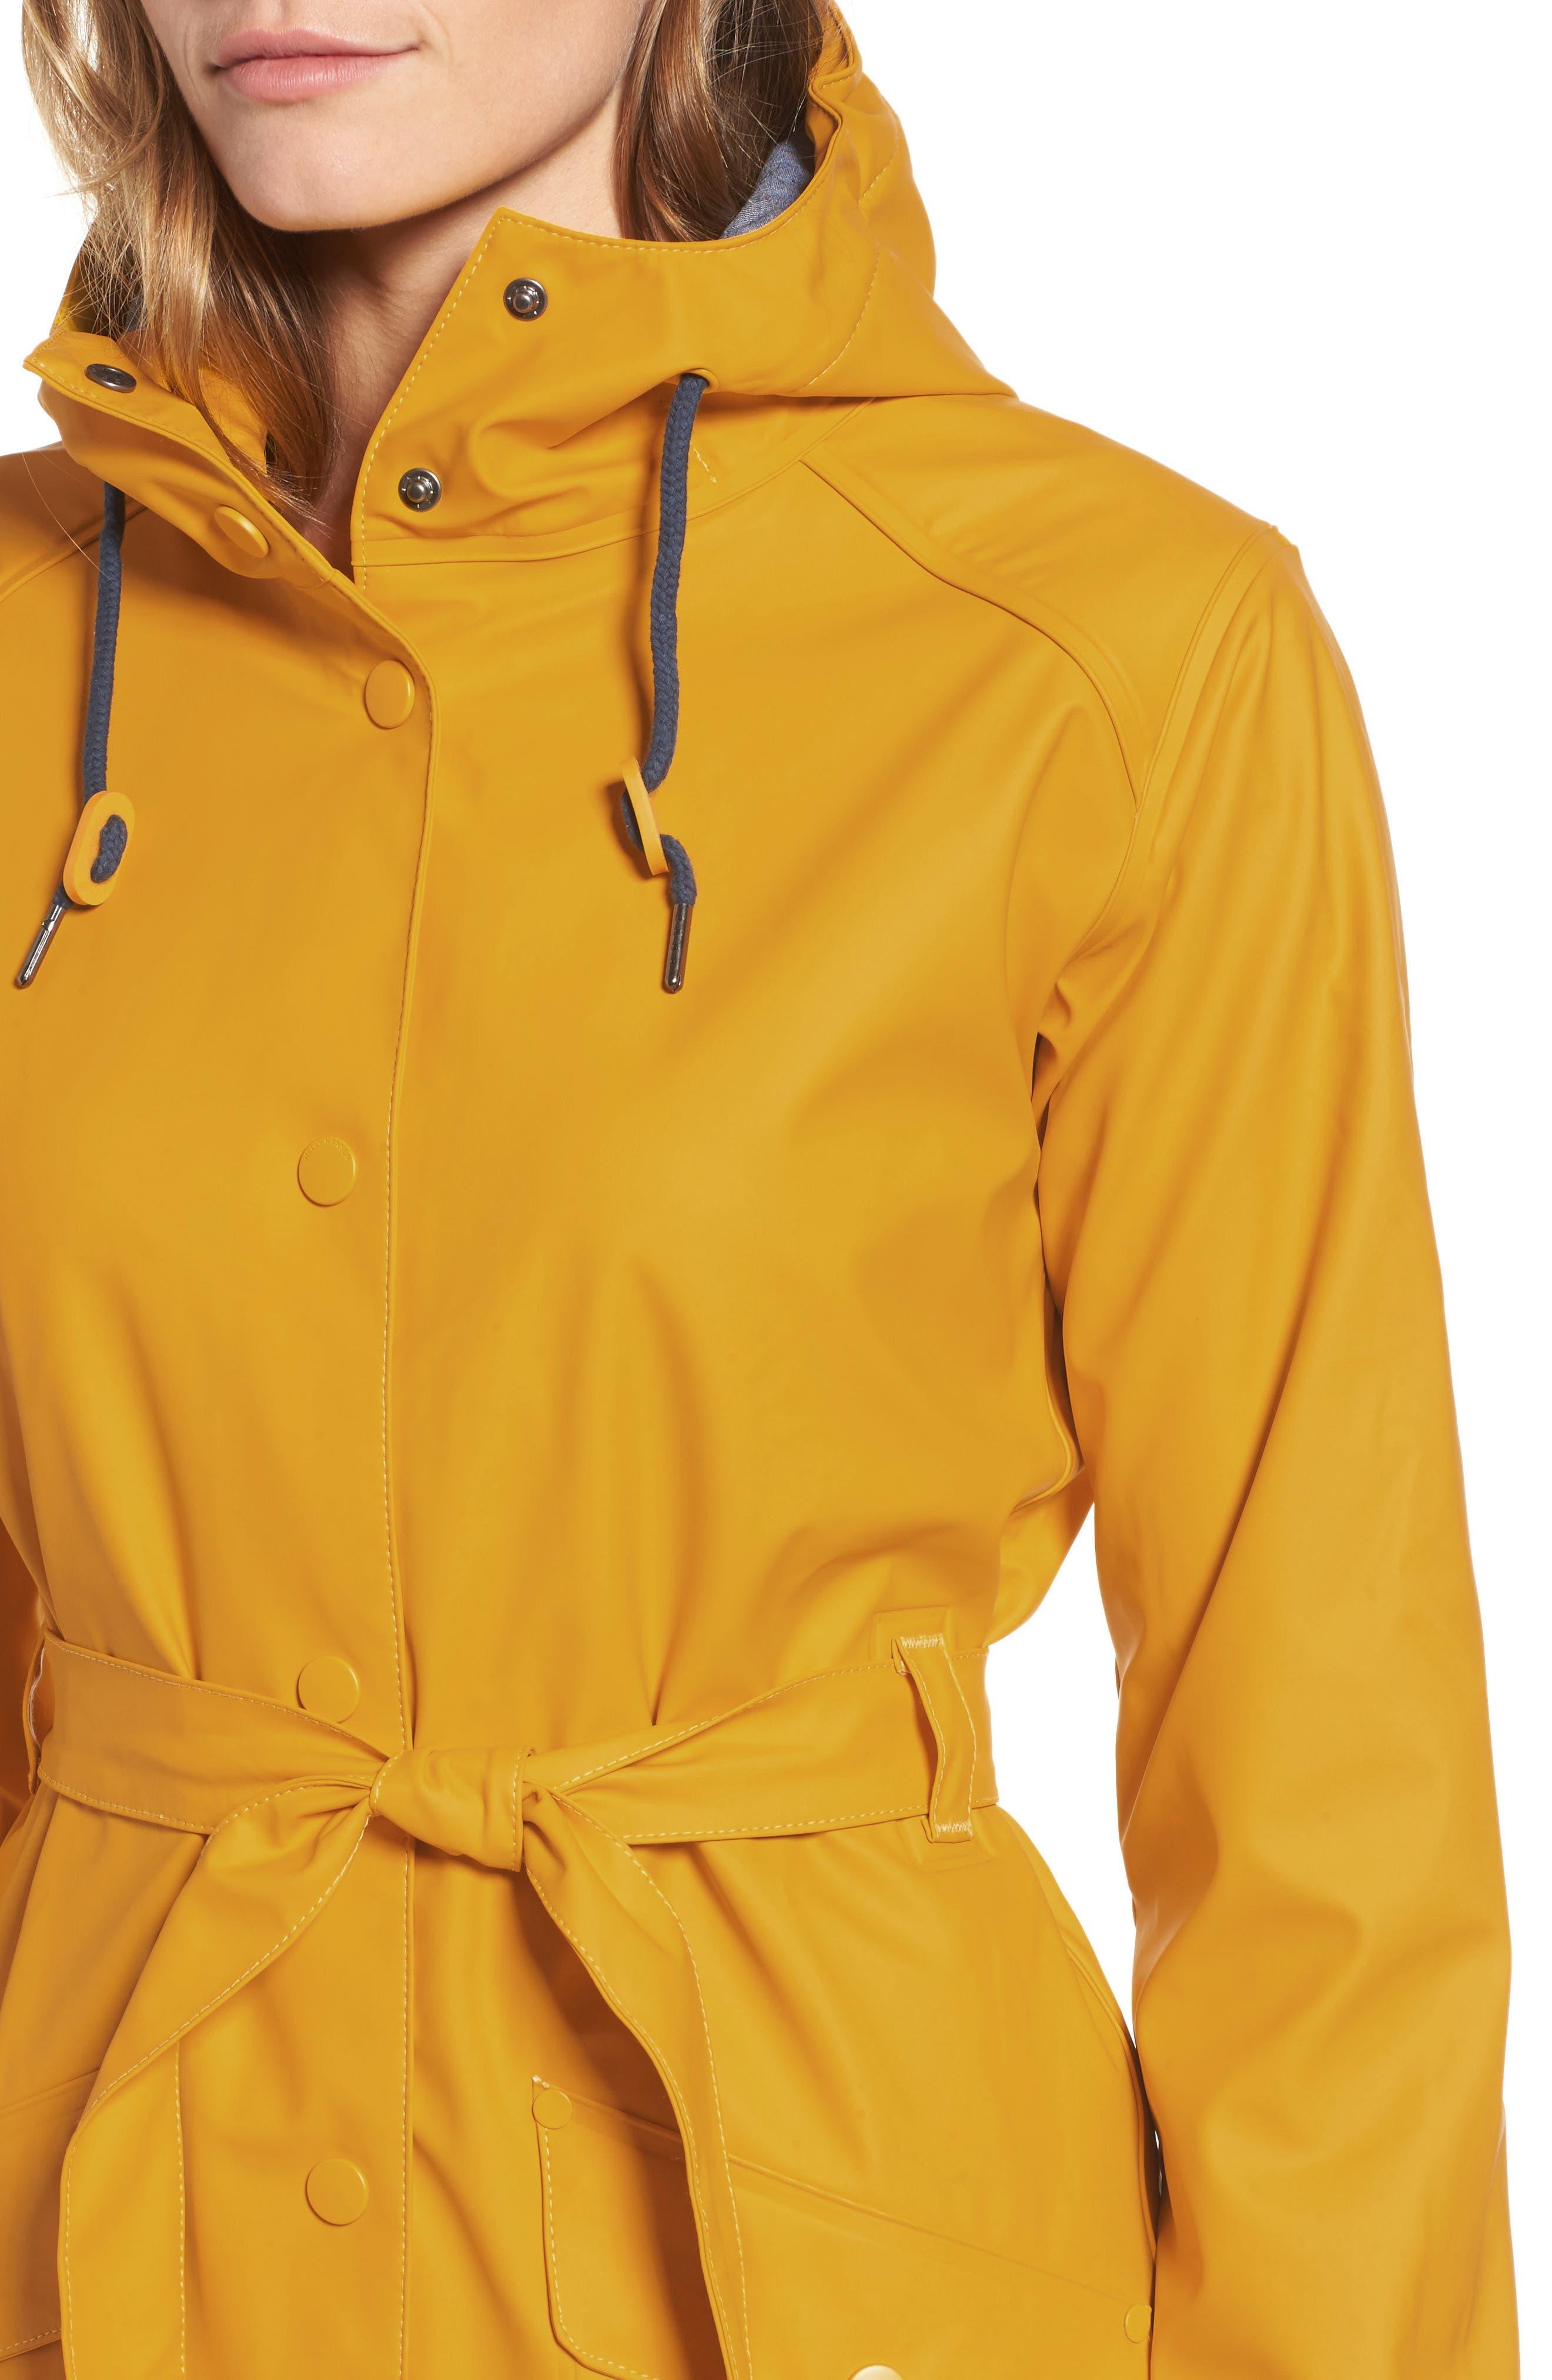 Kirkwall Raincoat,                             Alternate thumbnail 4, color,                             ESSENTIAL YELLOW